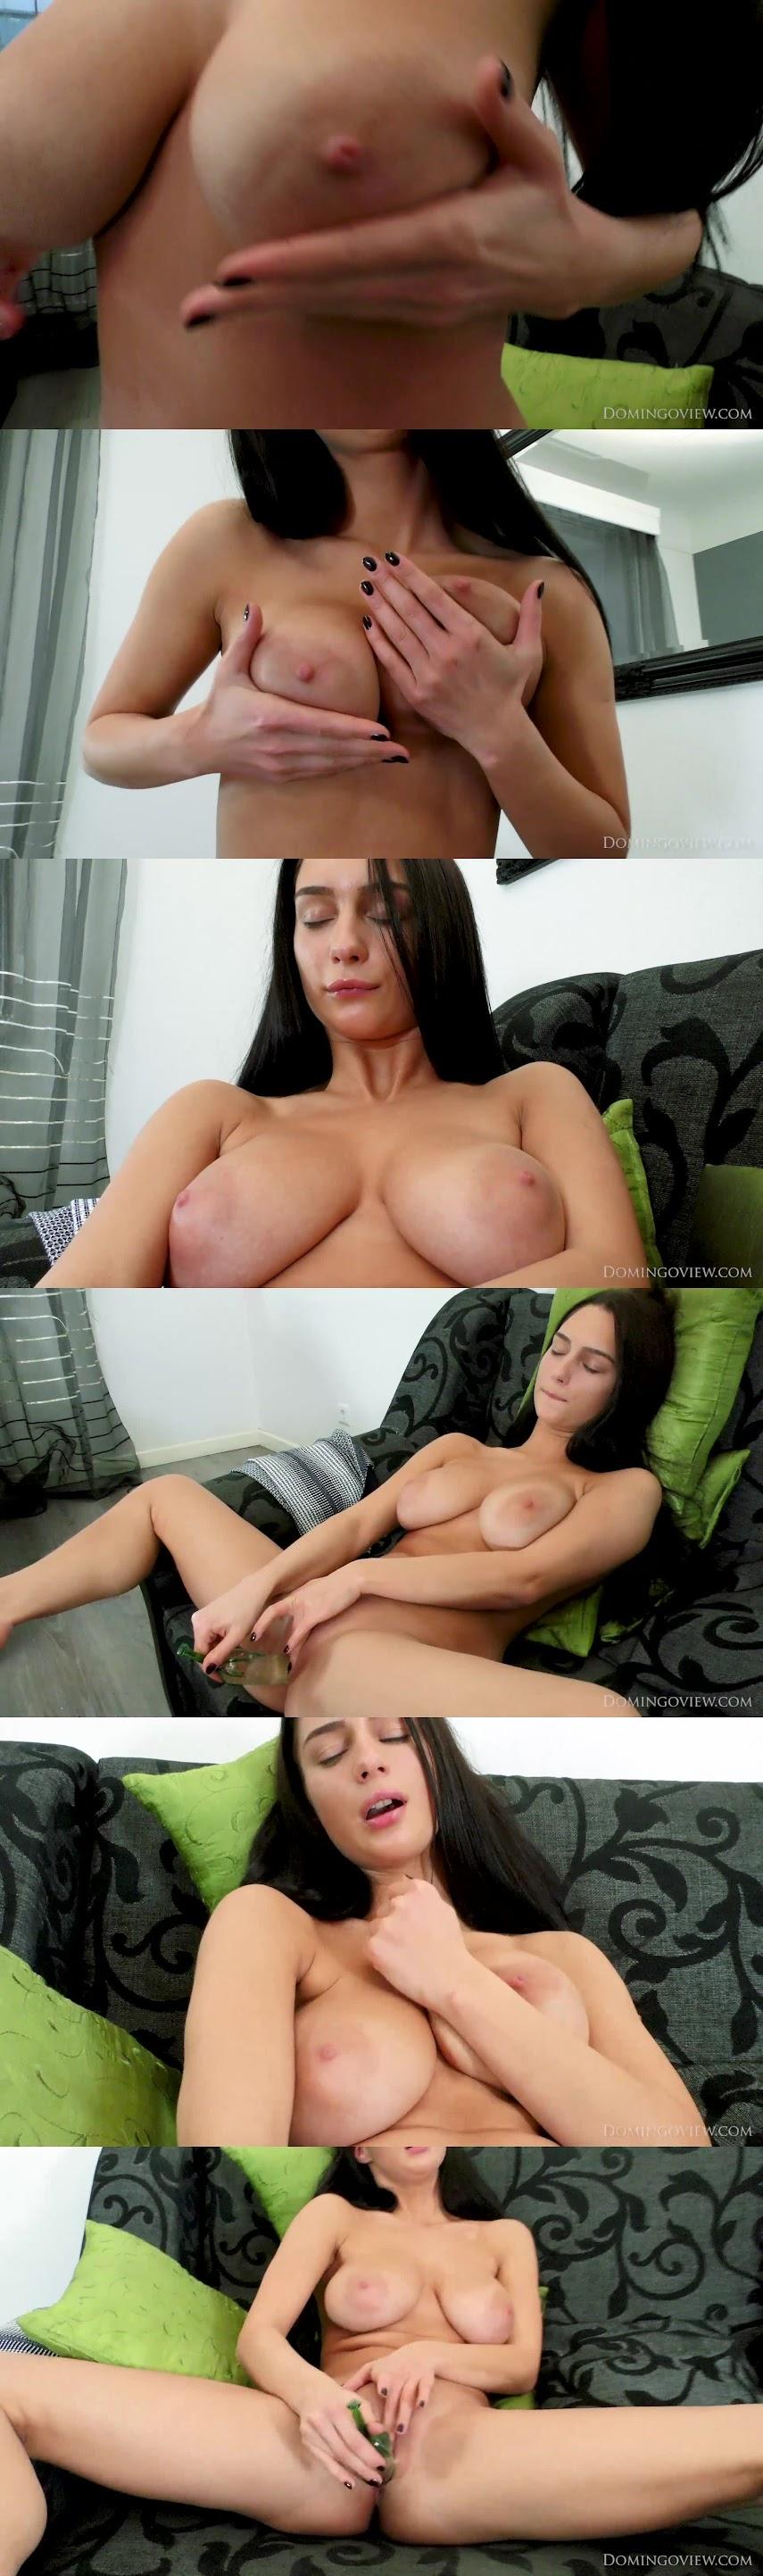 [DomingoView] Blera - Tv Show And Orgasm With A Glass Dildo domingoview 07020